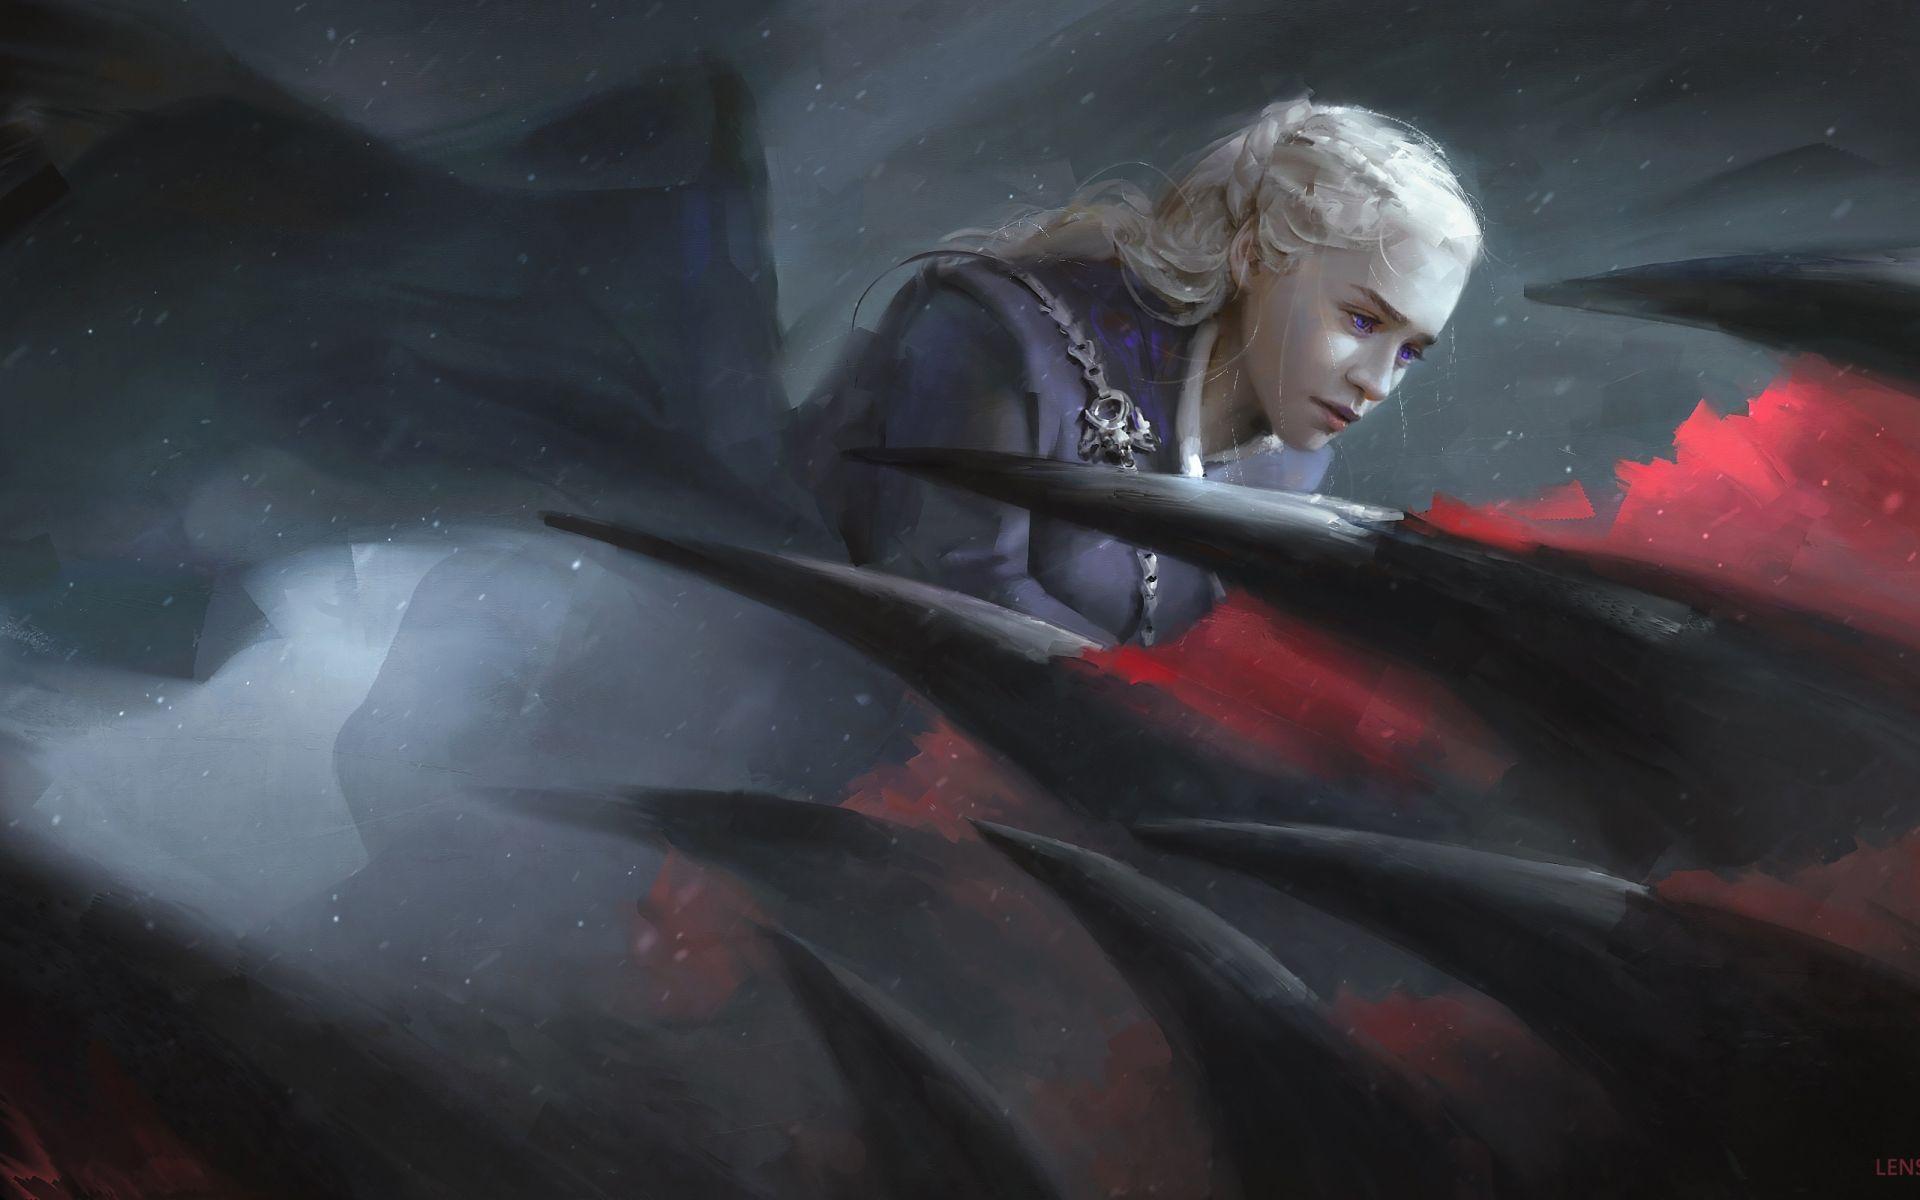 Game of Thrones fan art